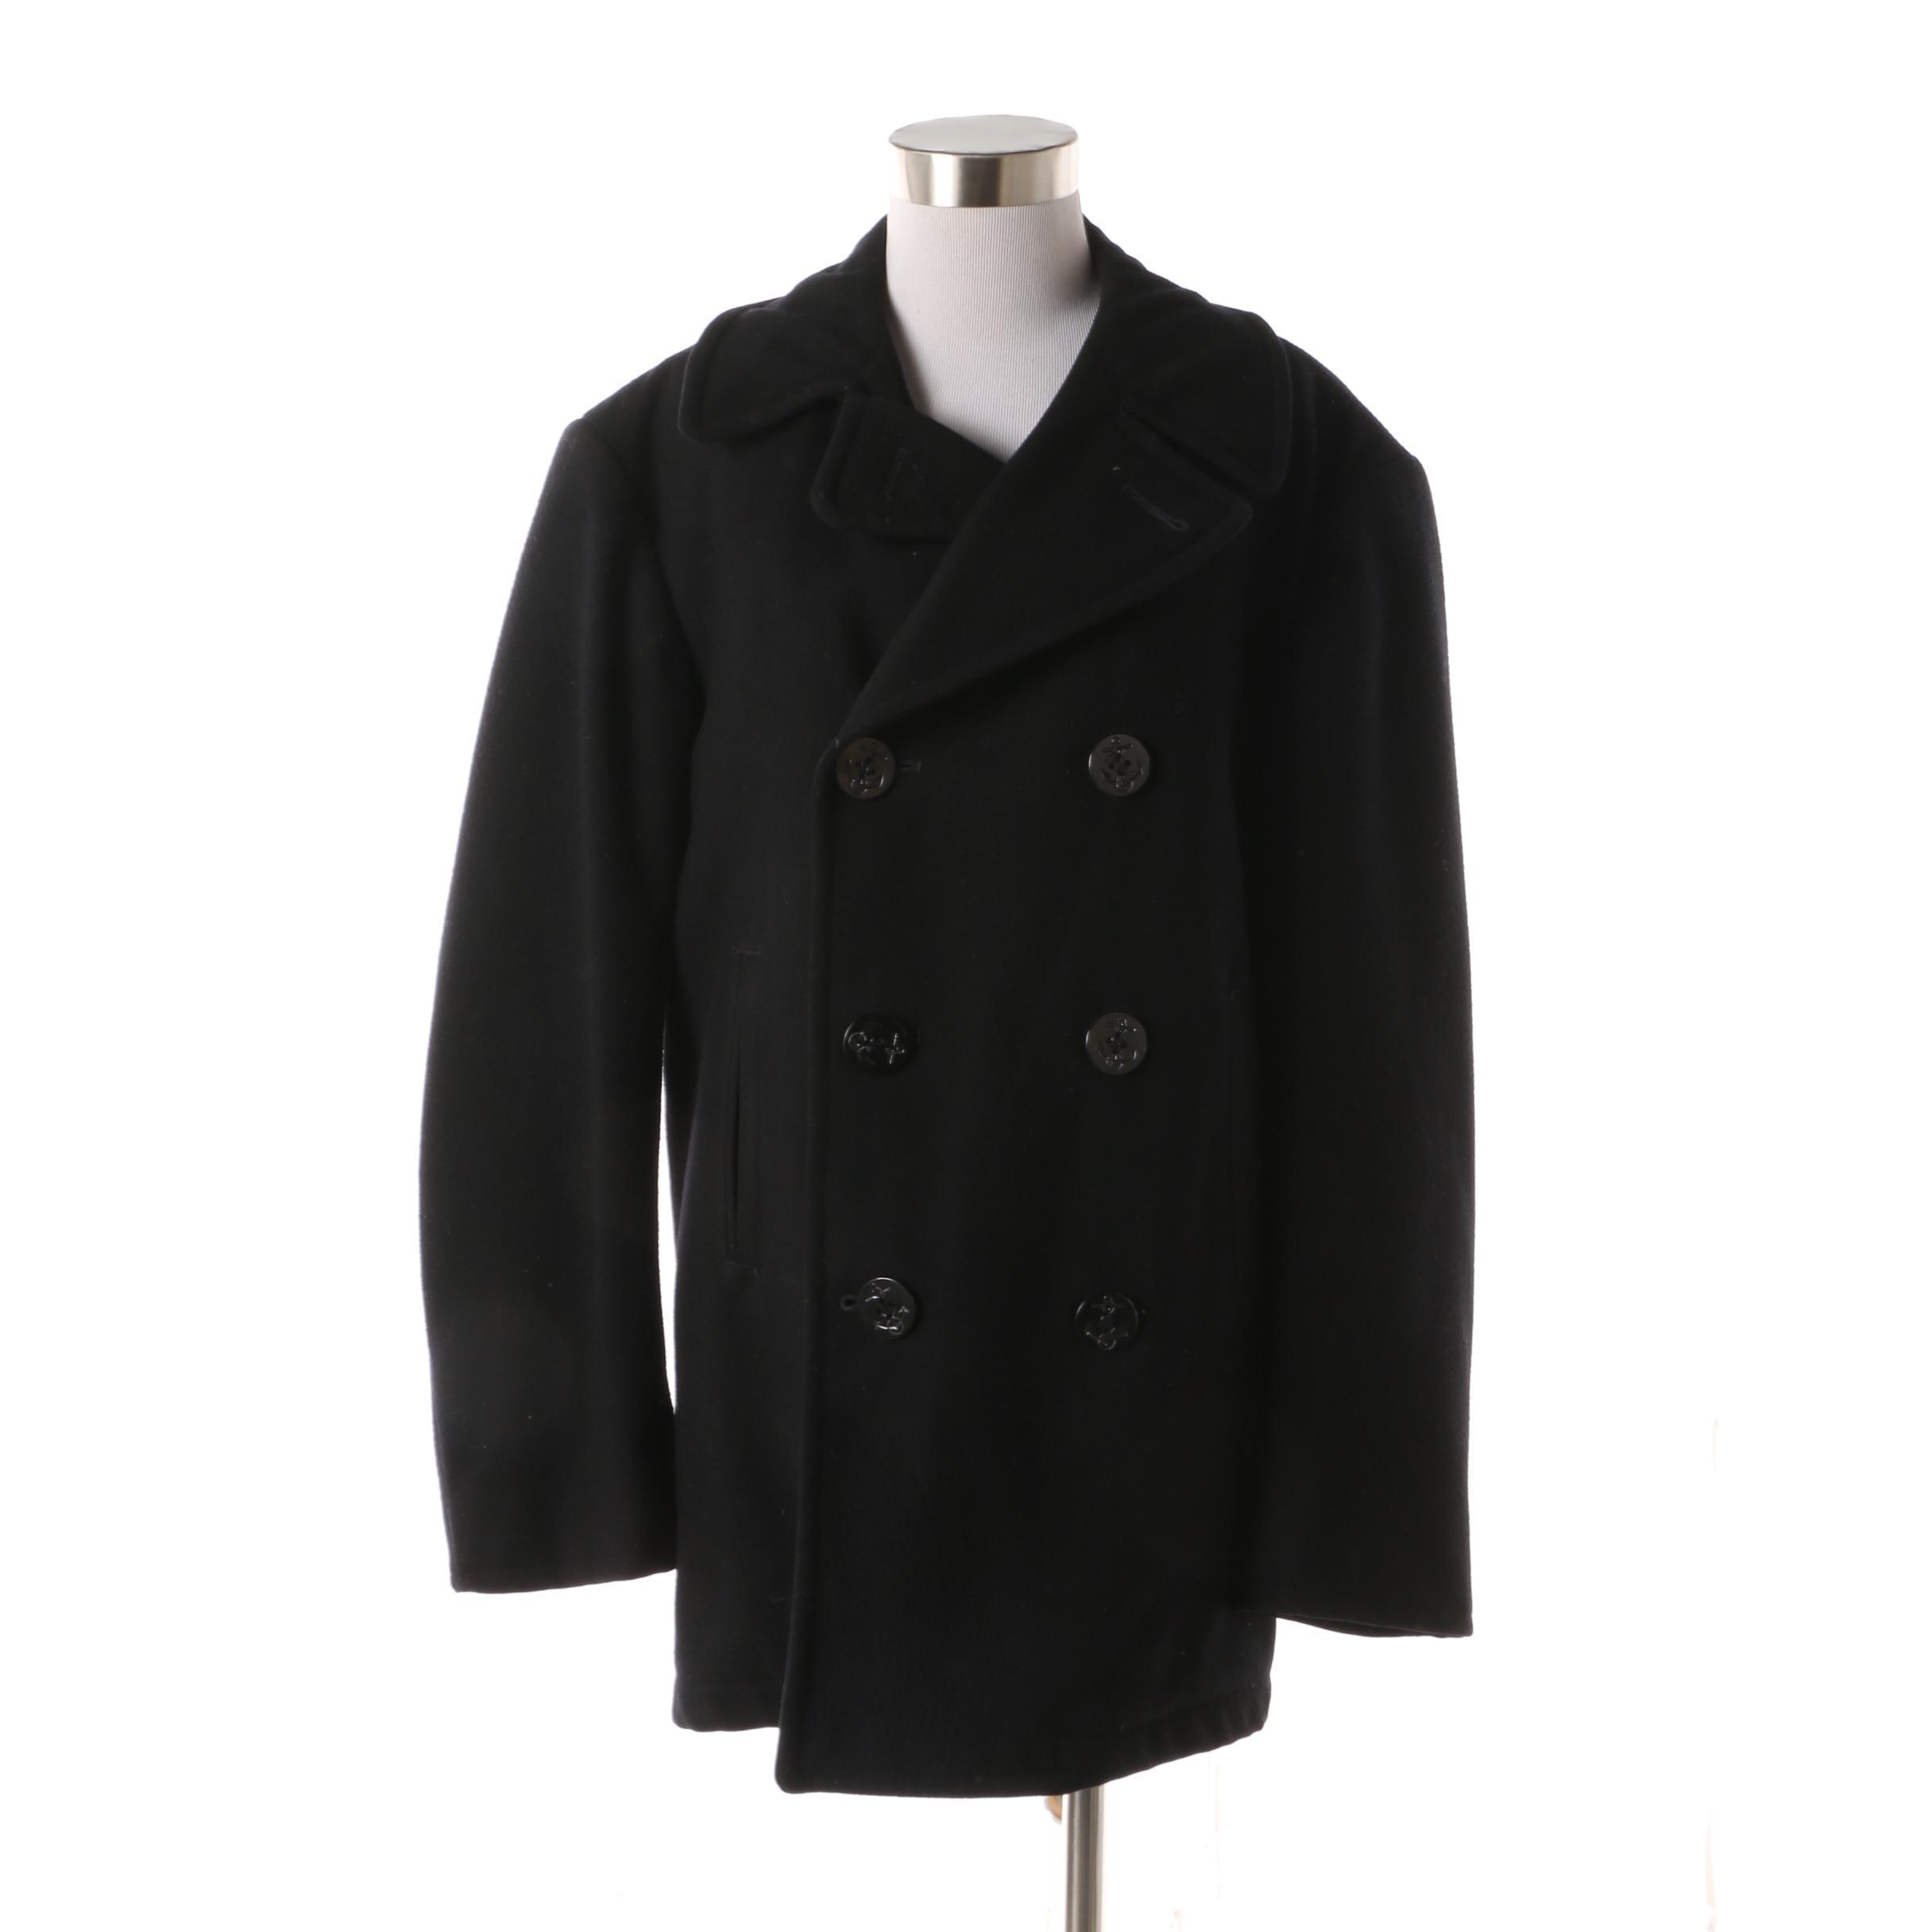 Men's Circa 1960s Vintage U.S. Navy Double-Breasted Black Wool Peacoat